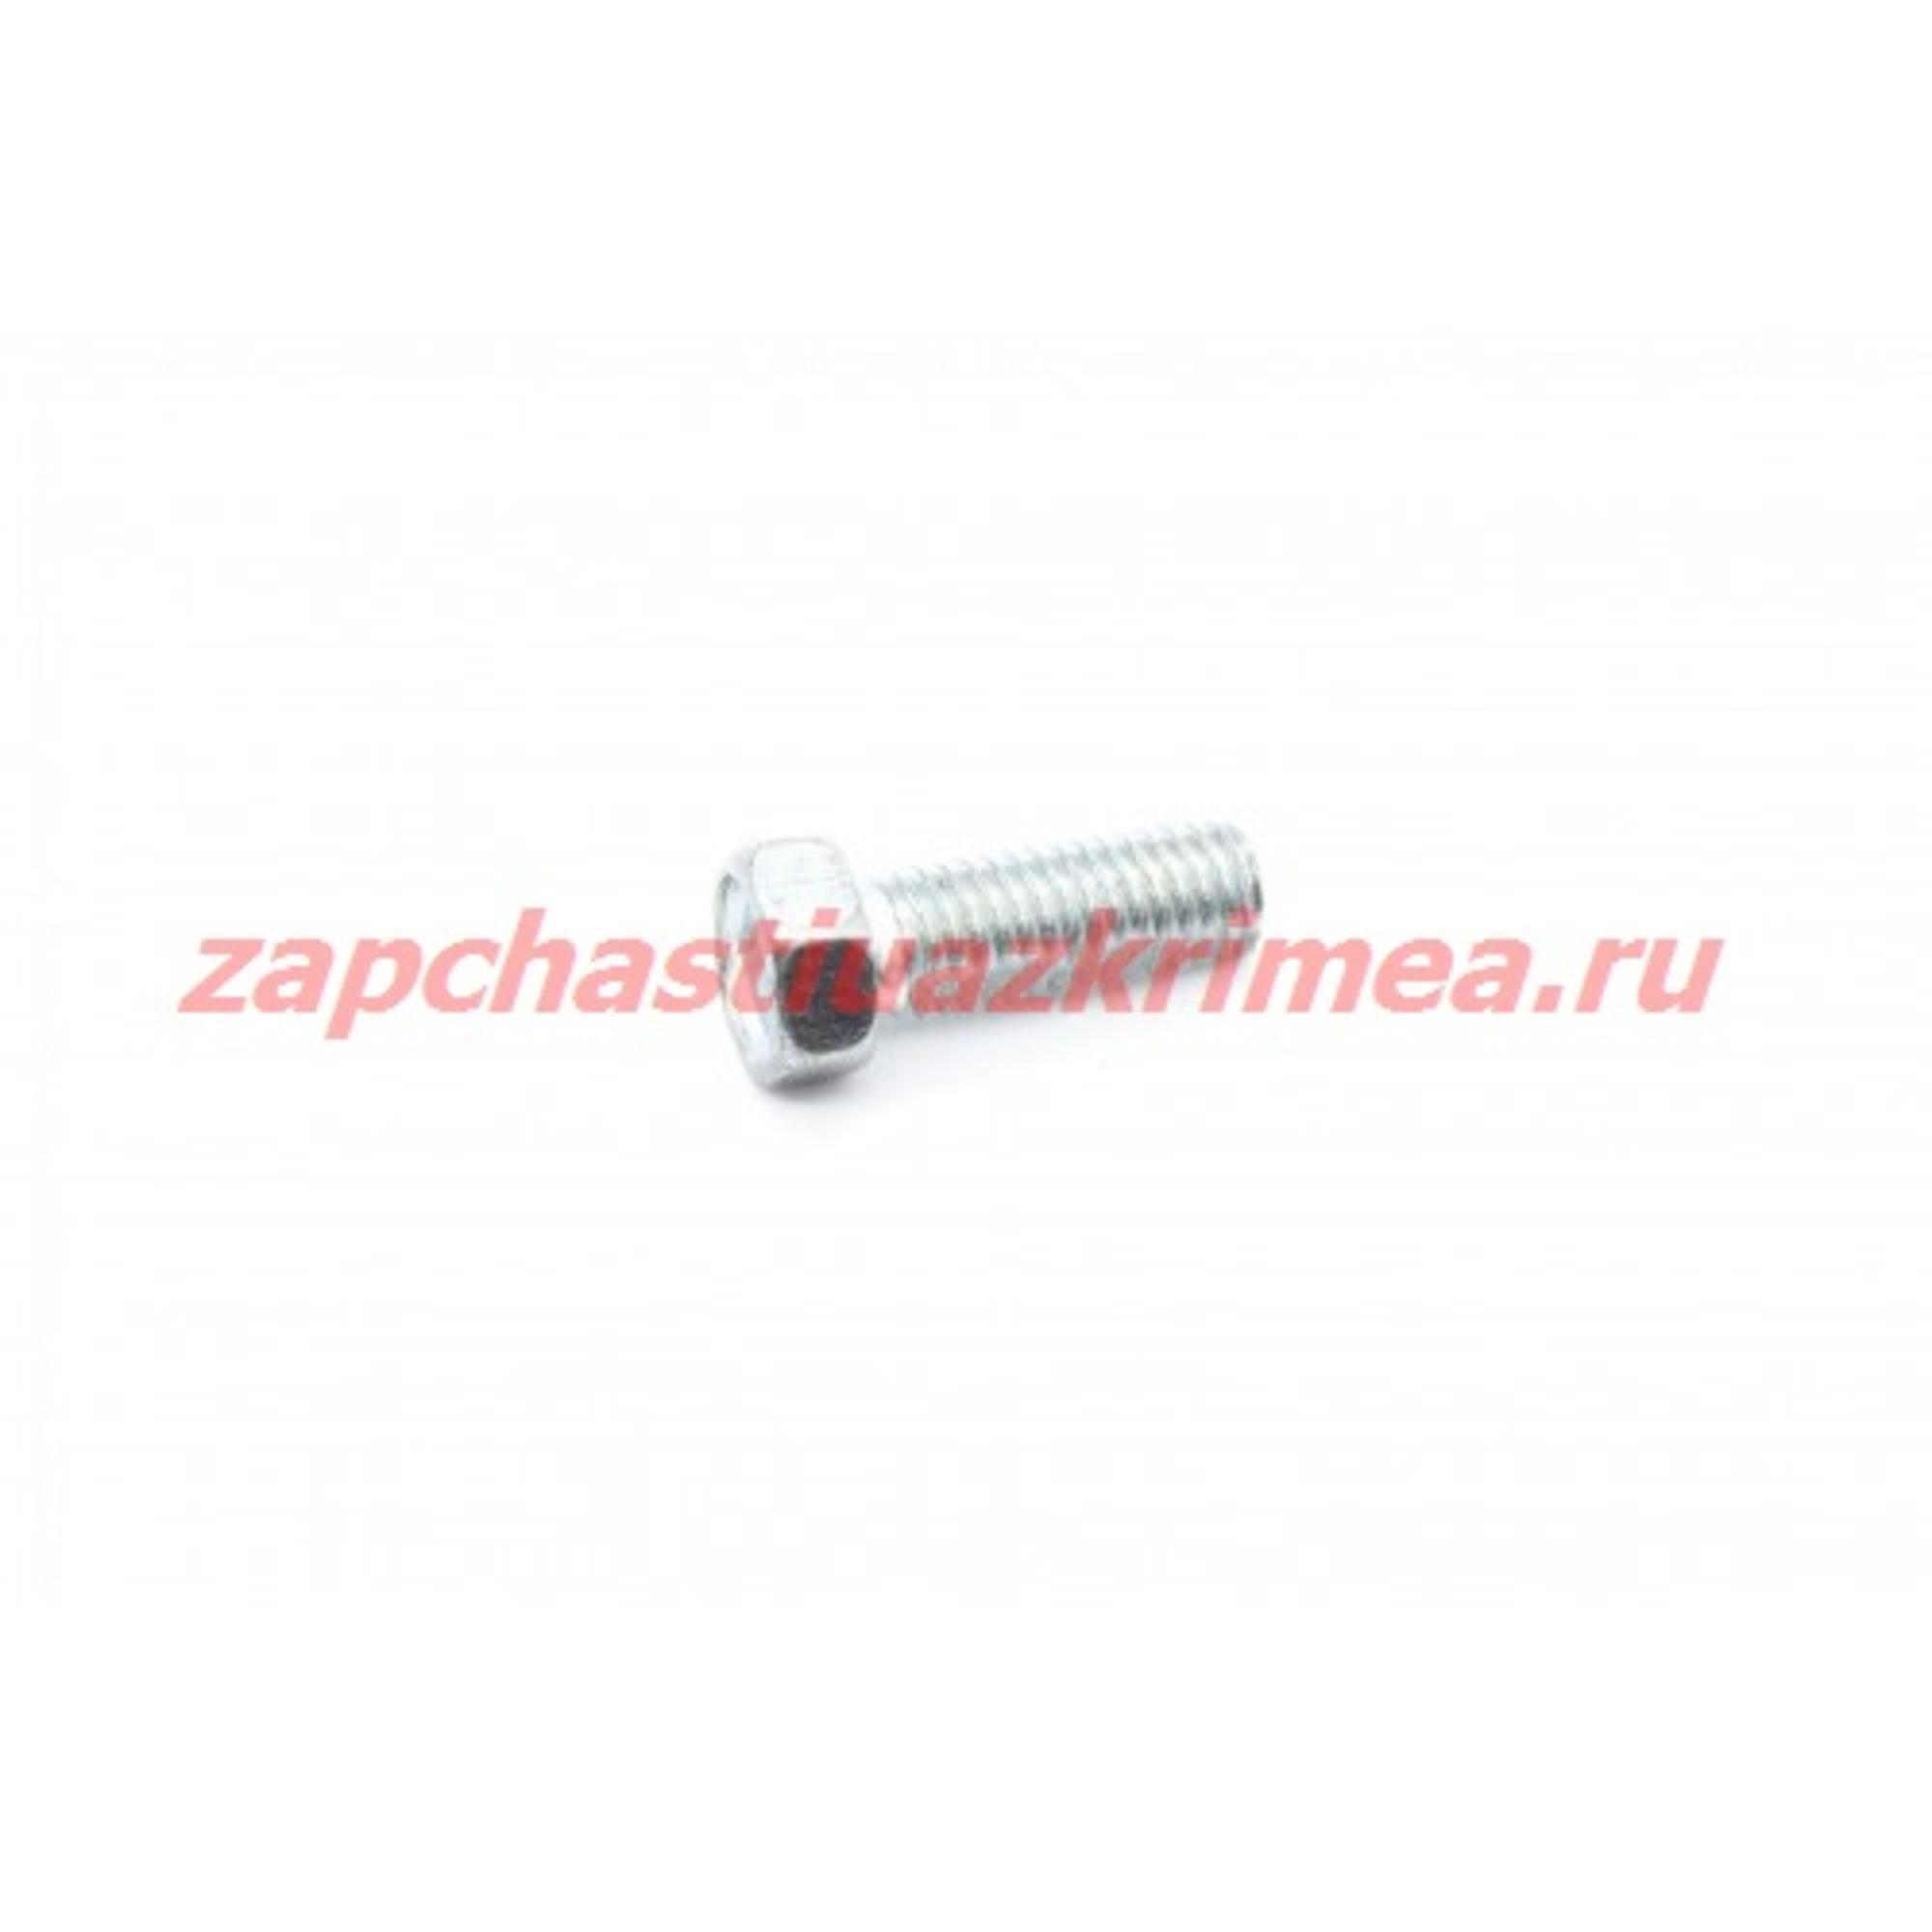 Болт М8х22 (min10) 201457-П29 201456-П29